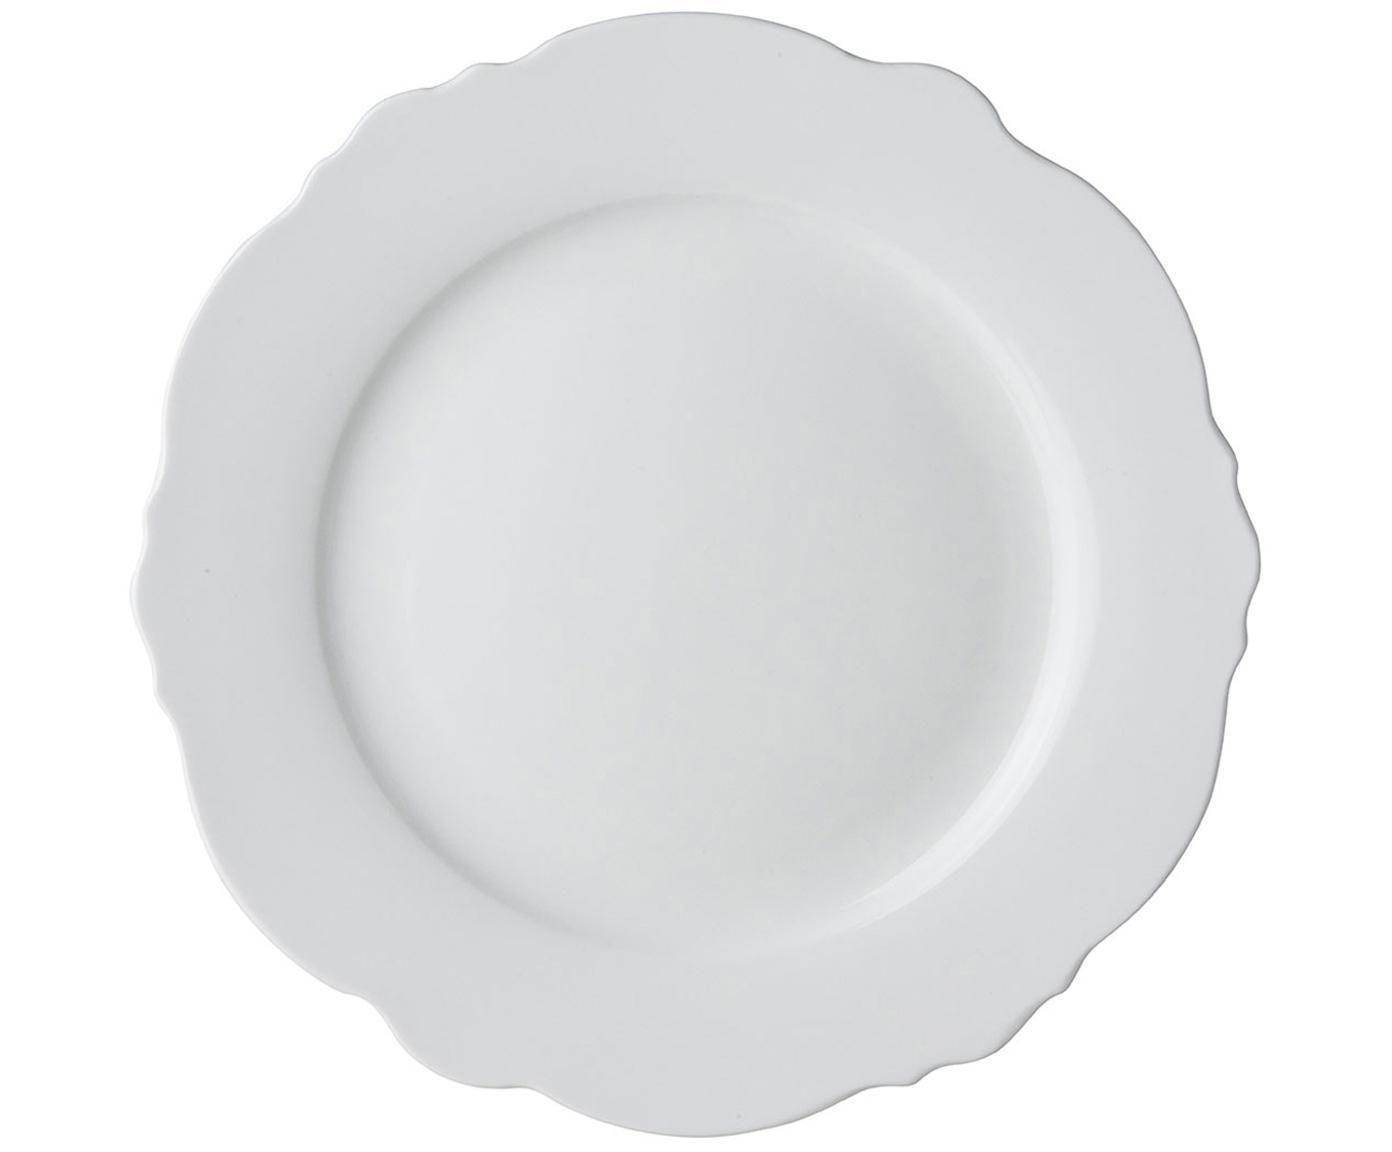 Speiseteller Muschel Loft, 4 Stück, Porzellan, Weiß, Ø 26 x H 2 cm